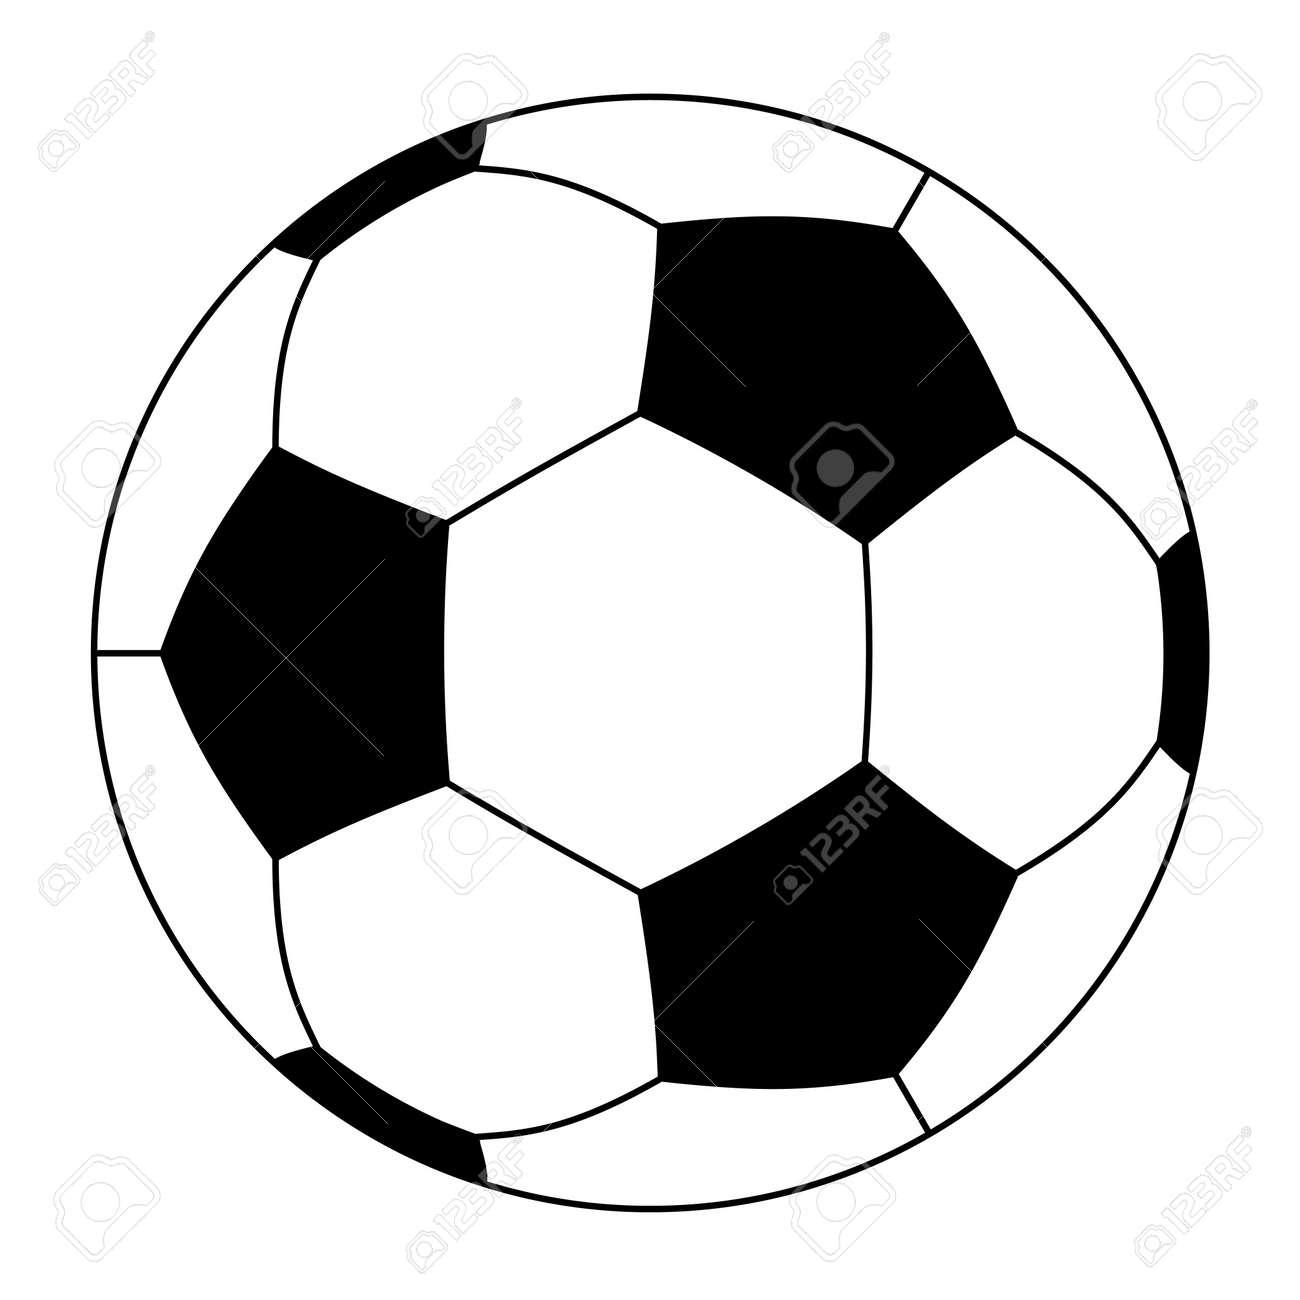 vector soccer ball royalty free cliparts vectors and stock rh 123rf com football soccer vector vector soccer ball icon